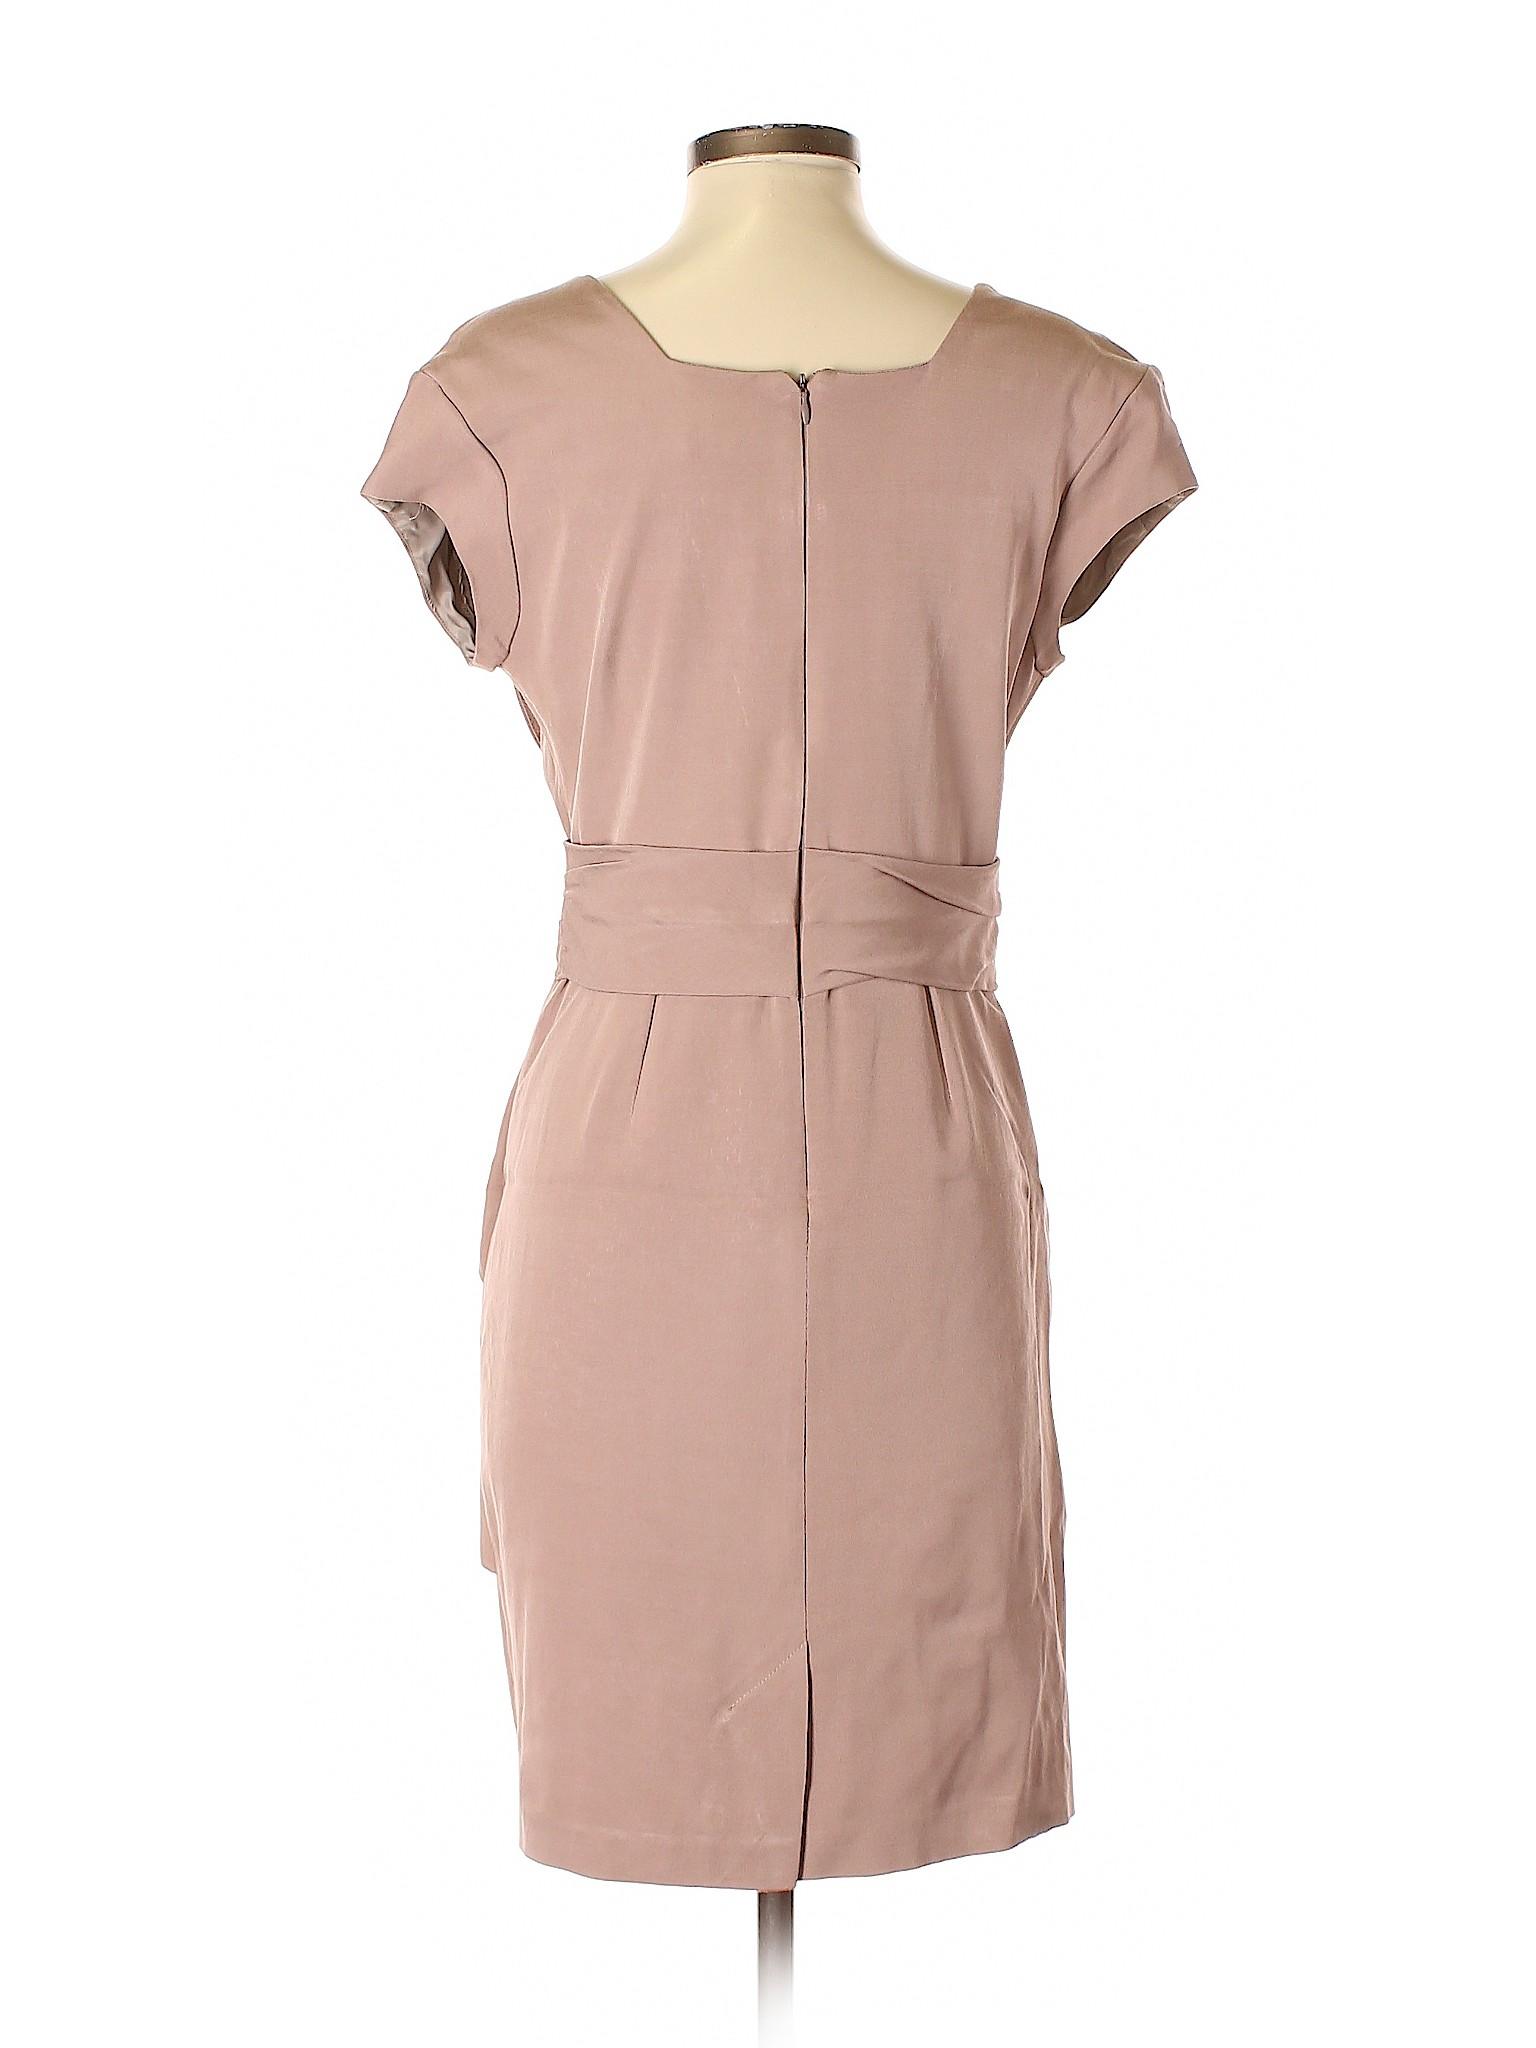 Dress Casual winter Dress Boutique Reiss winter Reiss Casual Boutique Reiss winter Boutique pOw6Apgq